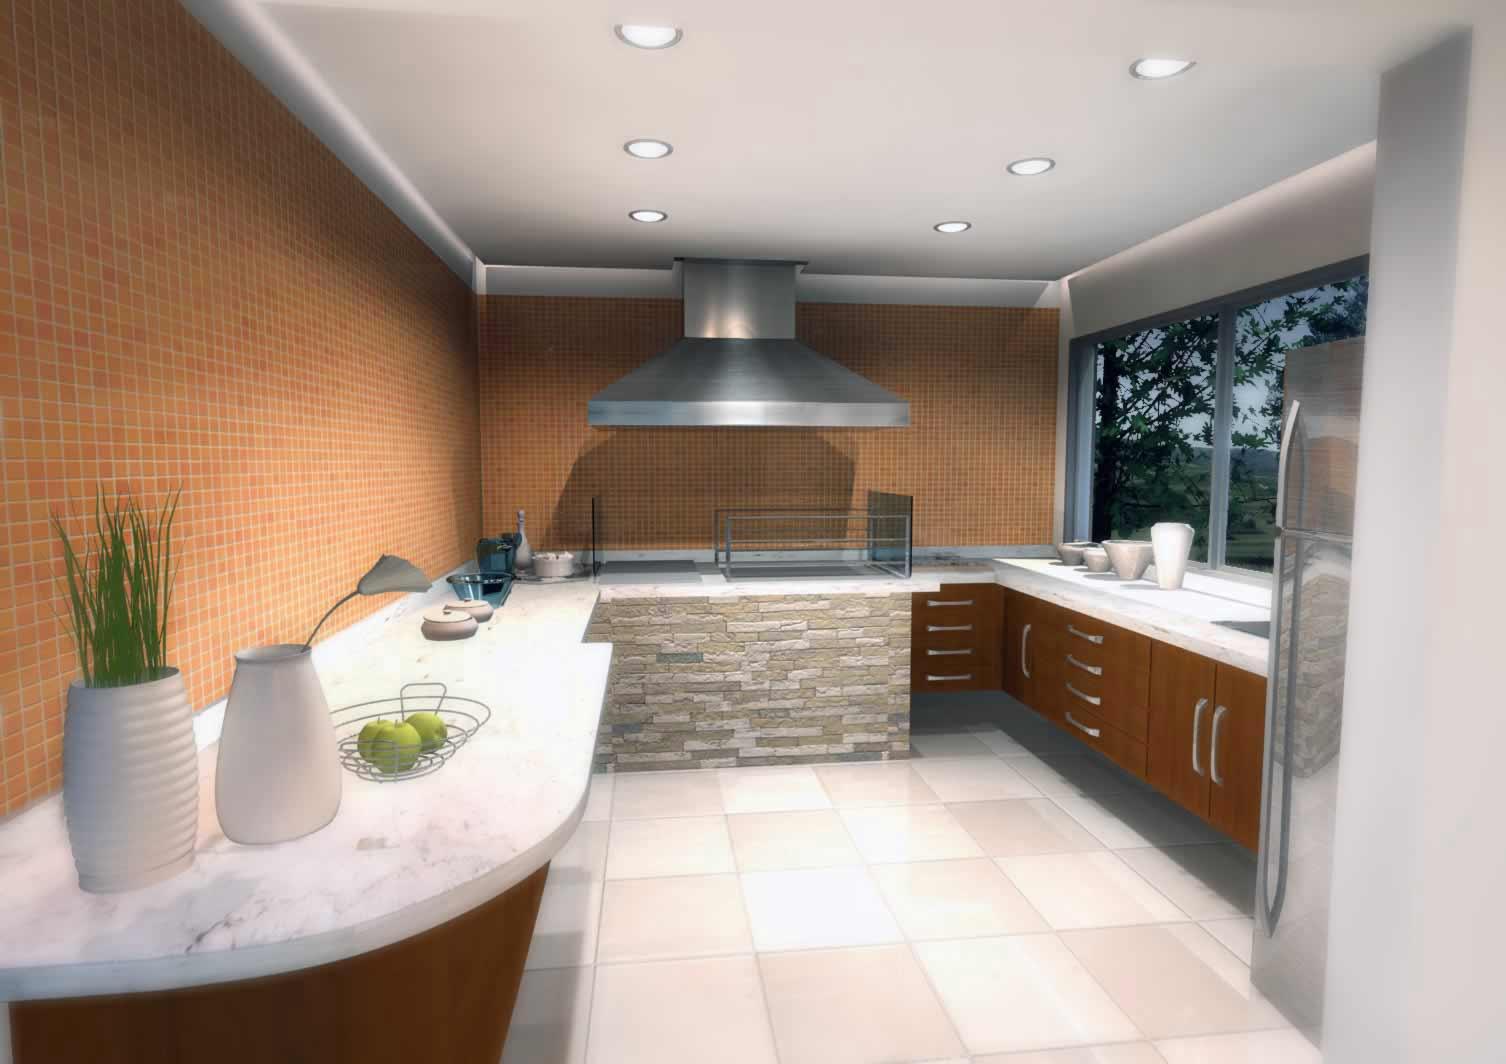 modern white tile kitchen flooring design small eat kitchen design photos cork floors